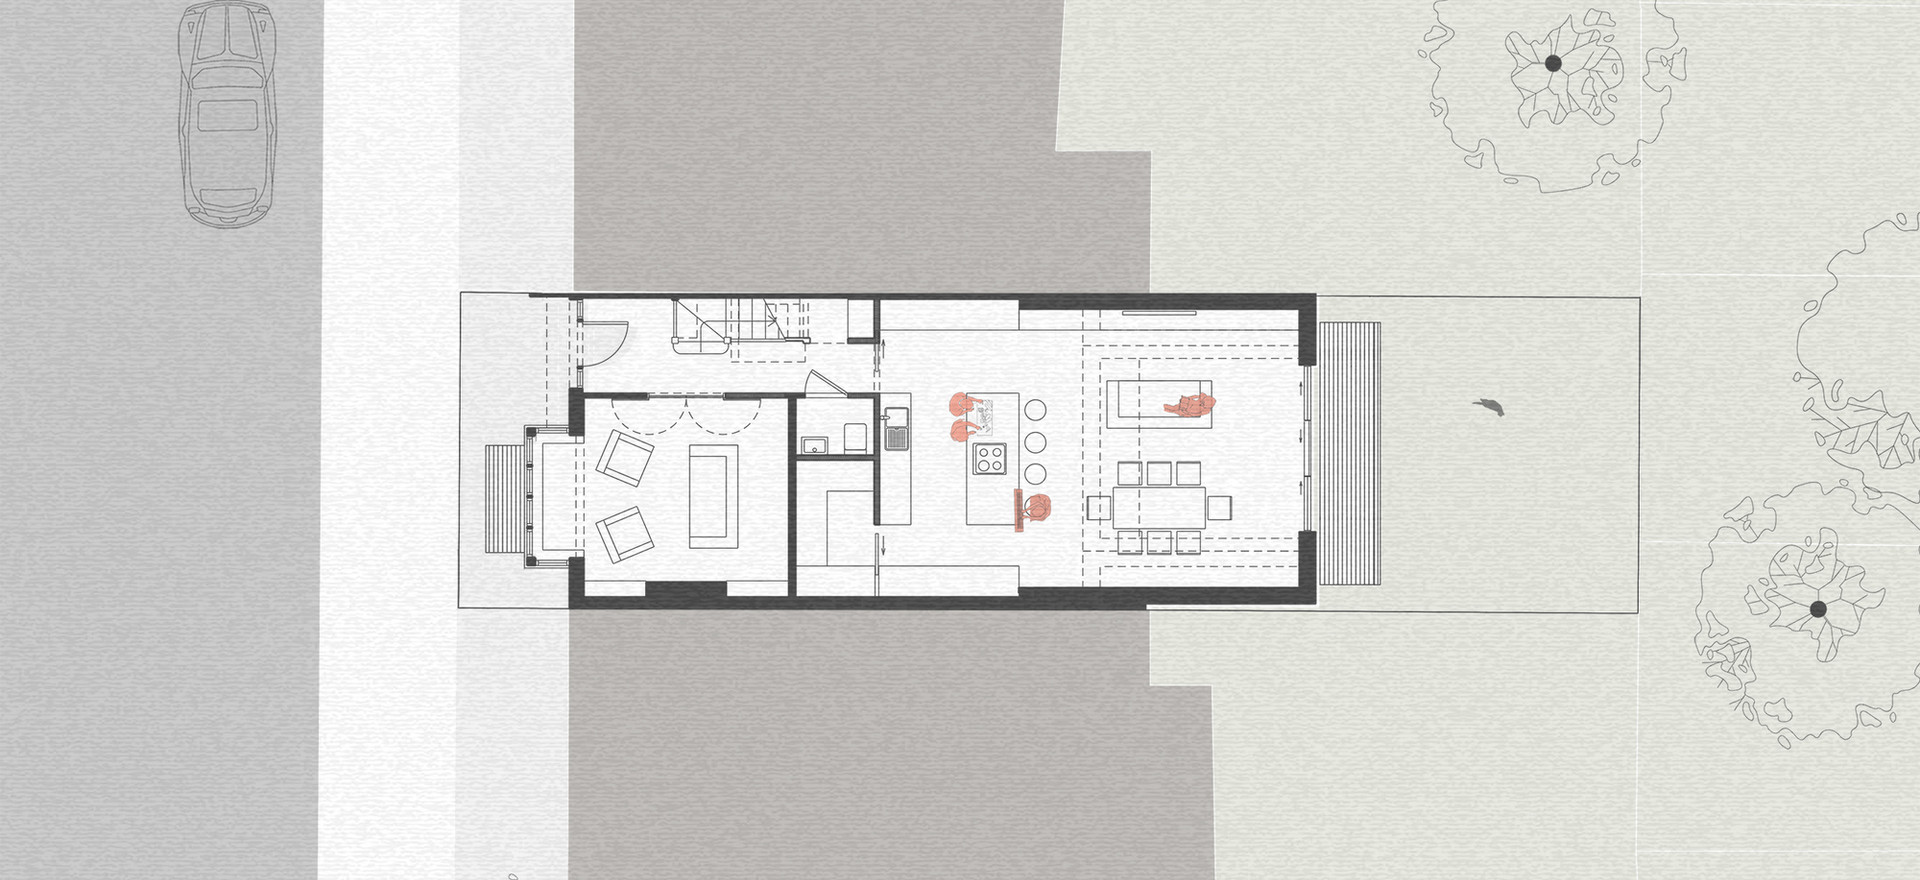 wr-ap_75AR_ground floor plan.jpg